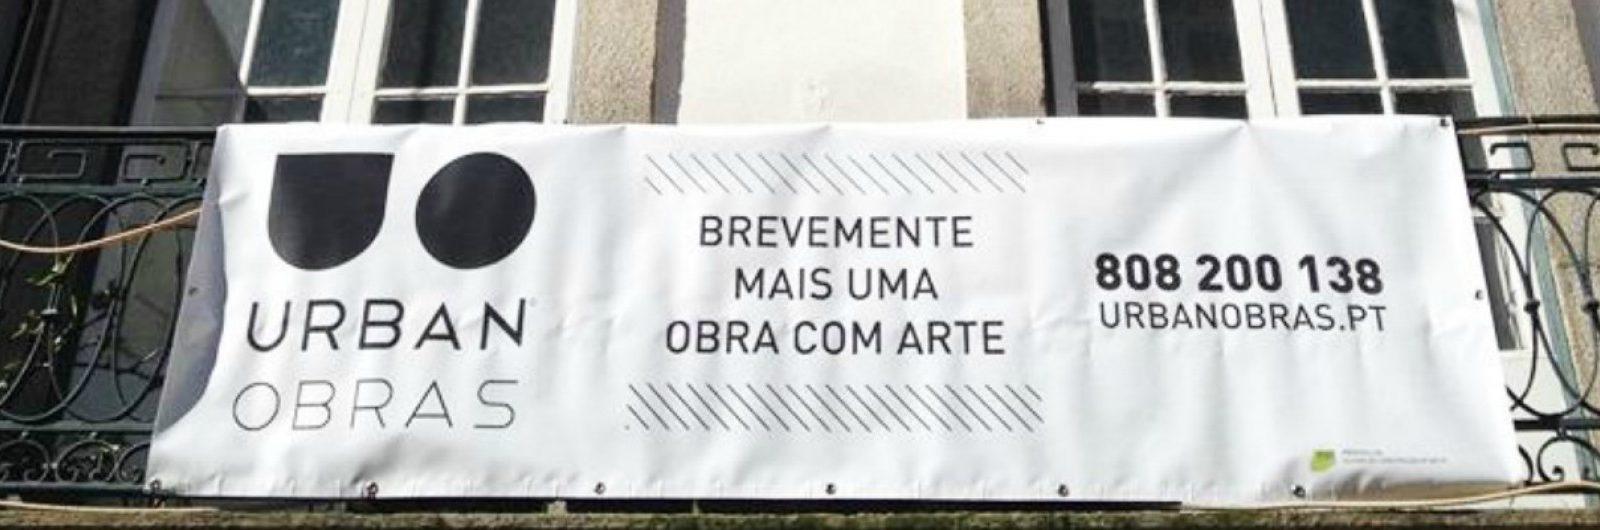 NBrand lança Urban Obras